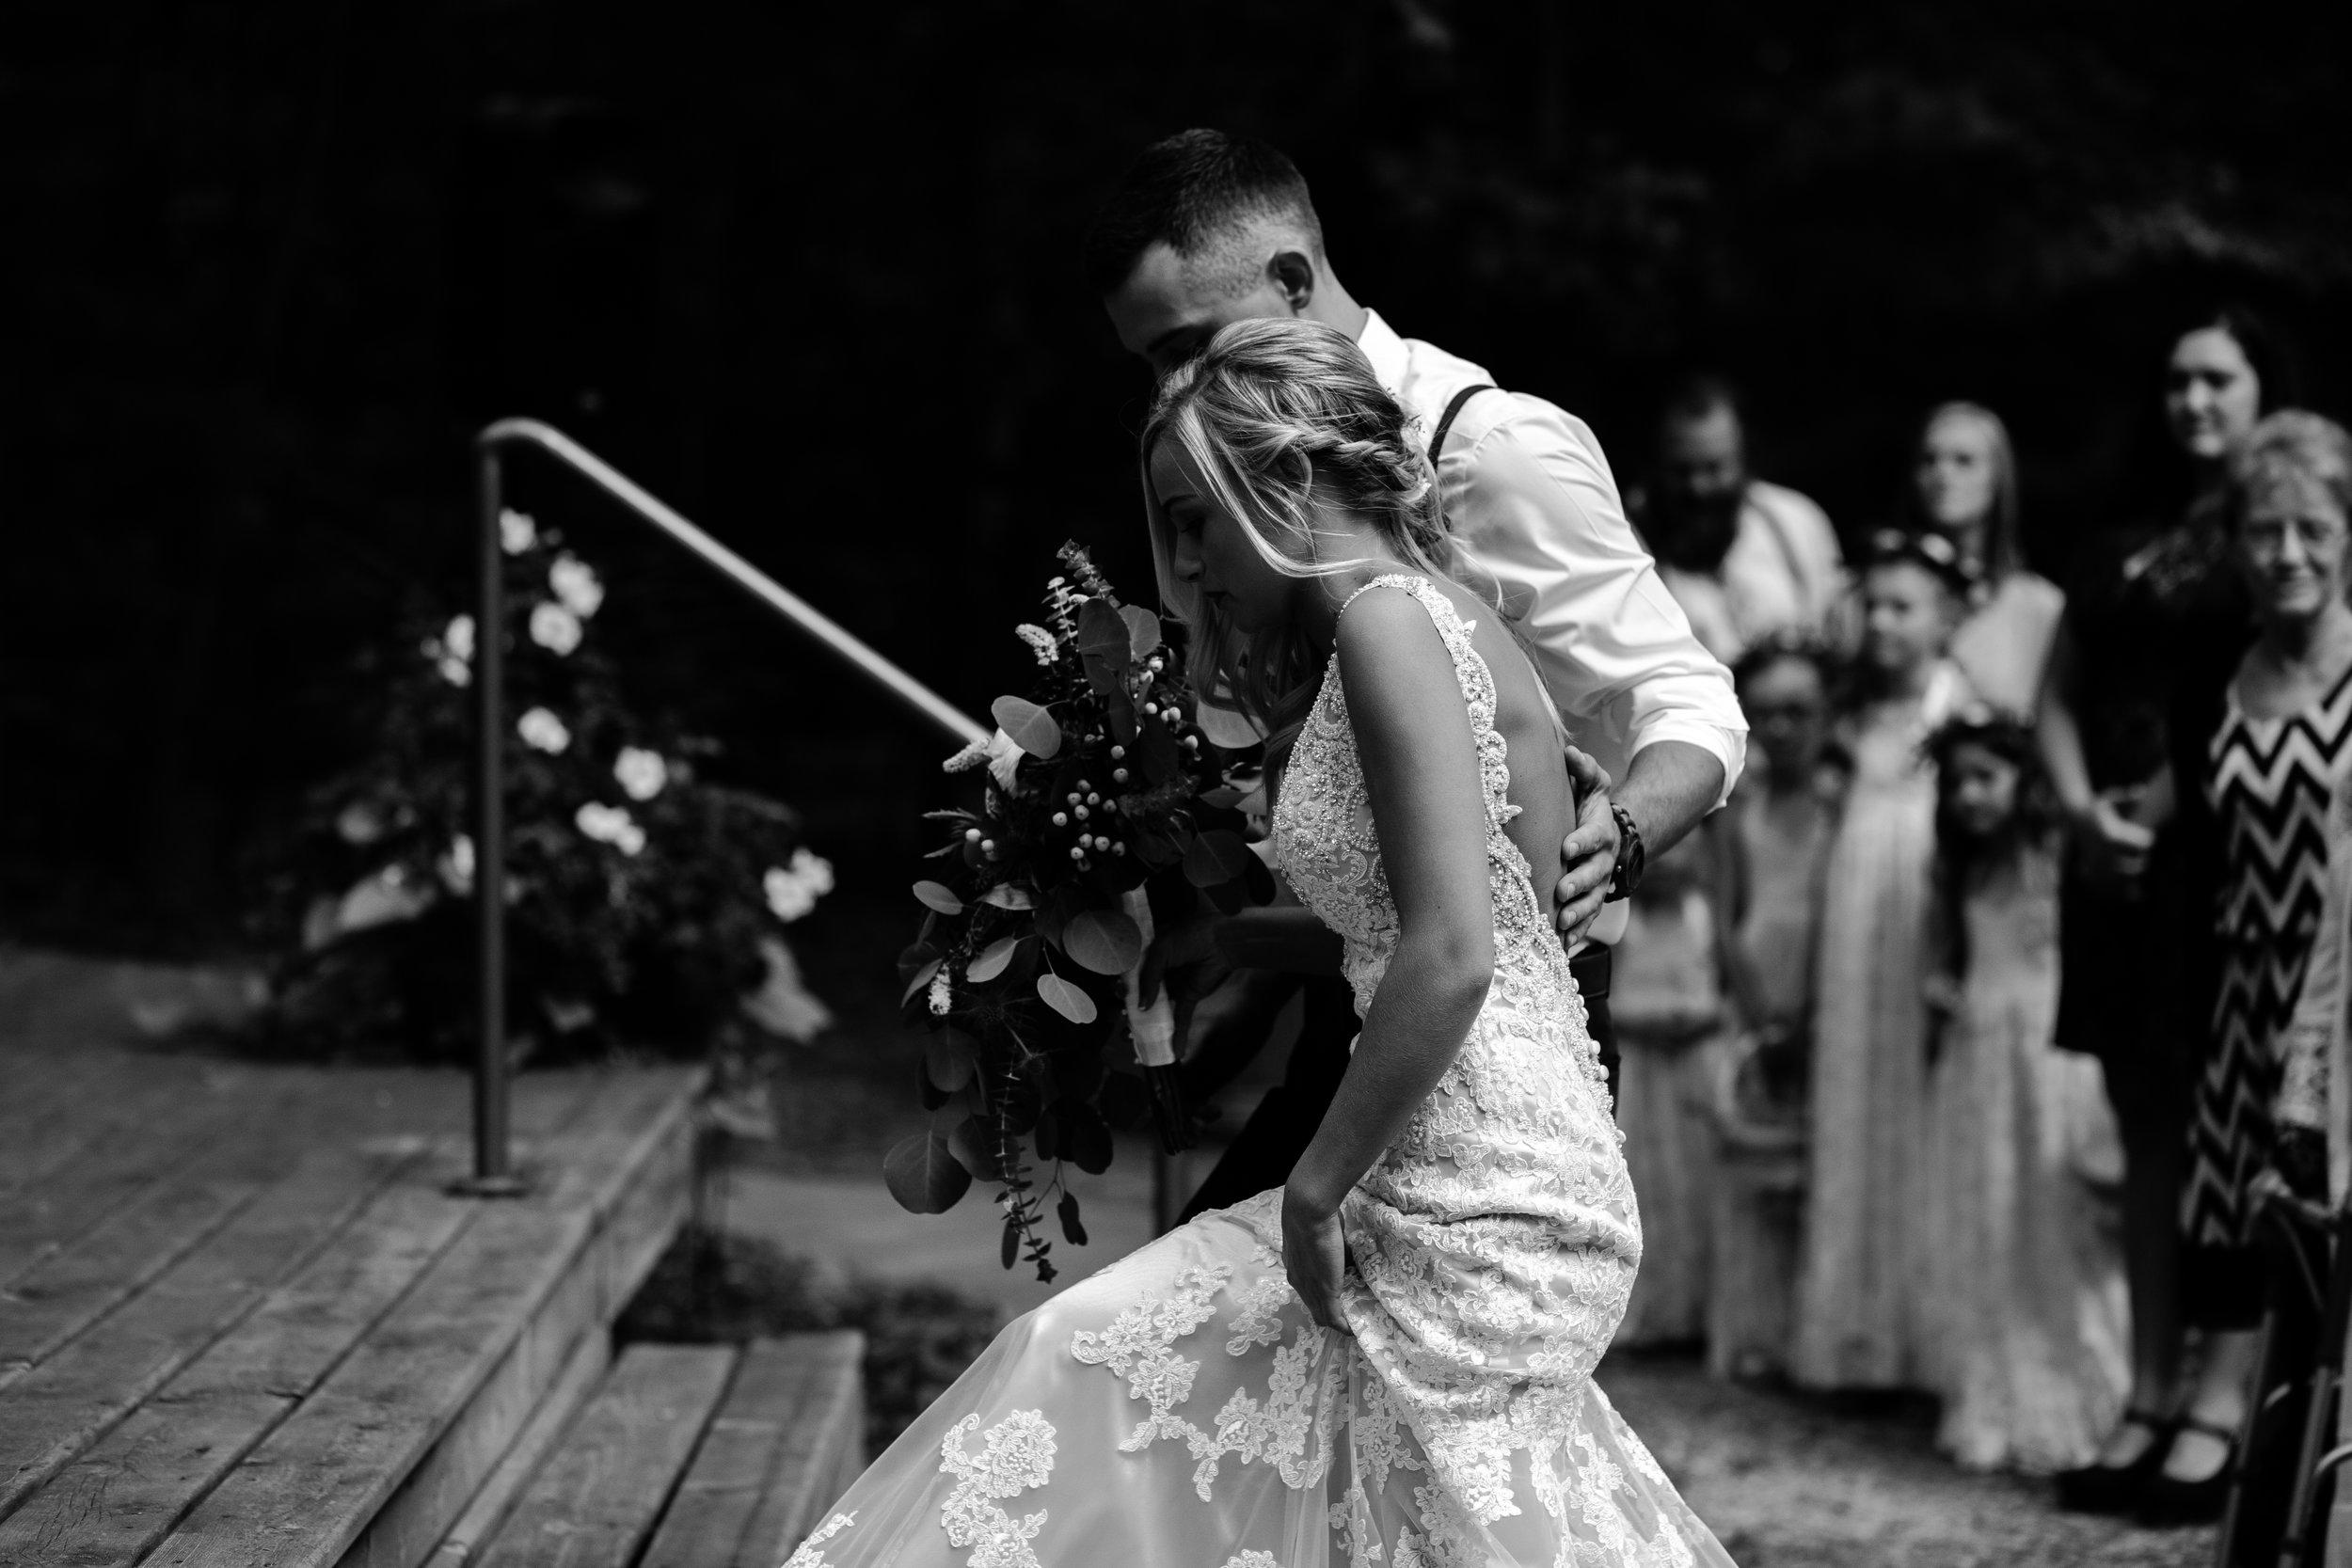 west-michigan-wedding-photographer-whitehall-rachel-austin-chapel-in-the-pines-264.jpg